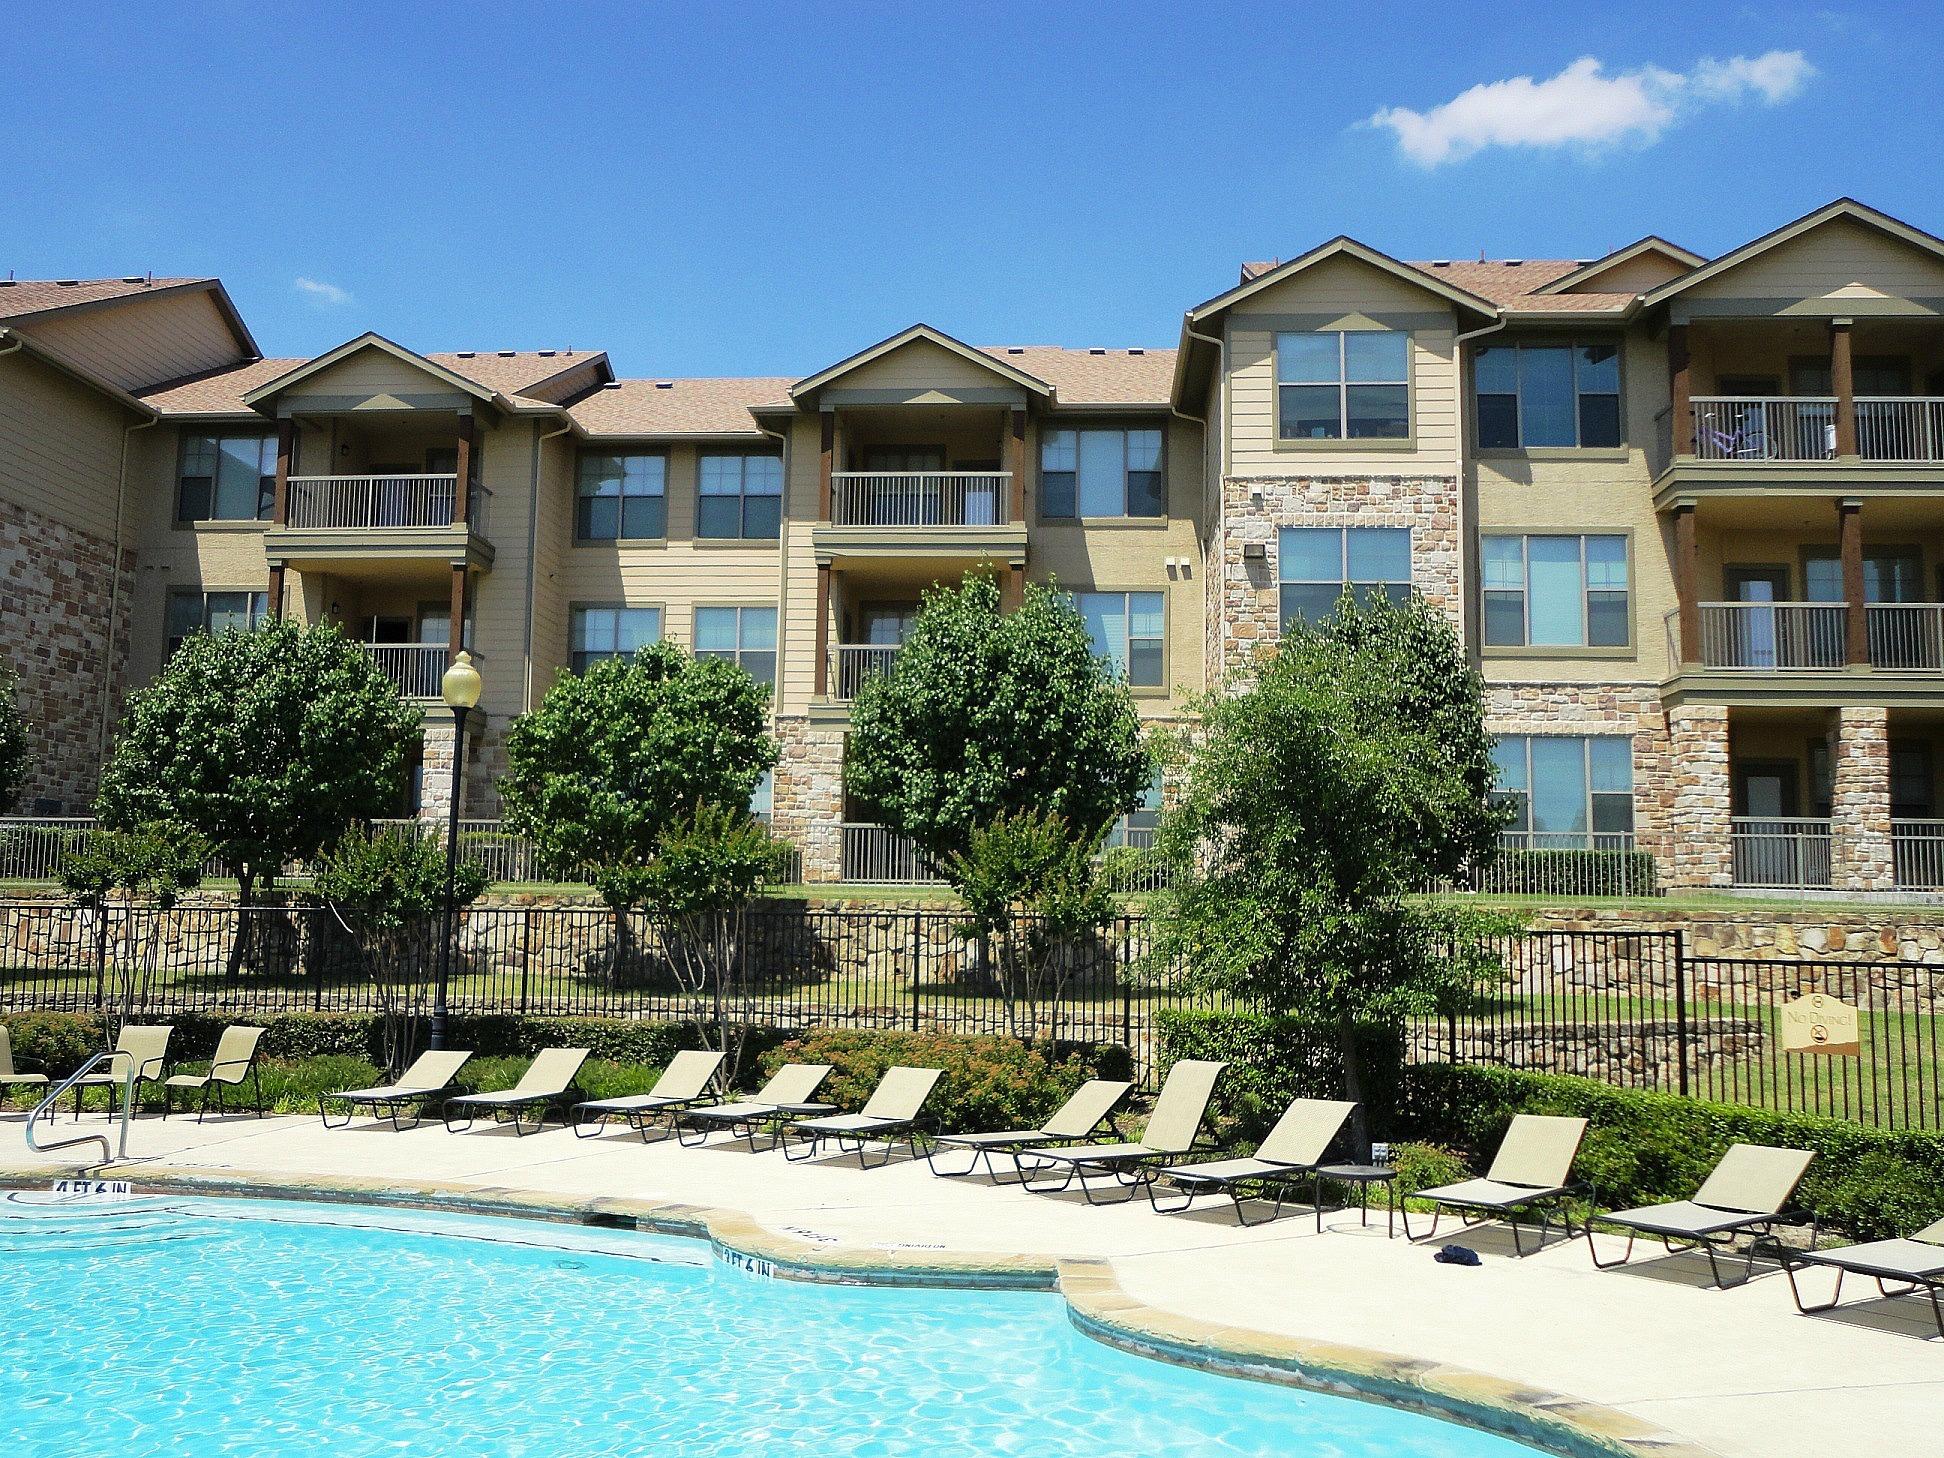 Huntington Ridge - Desoto, TX Apartments for rent